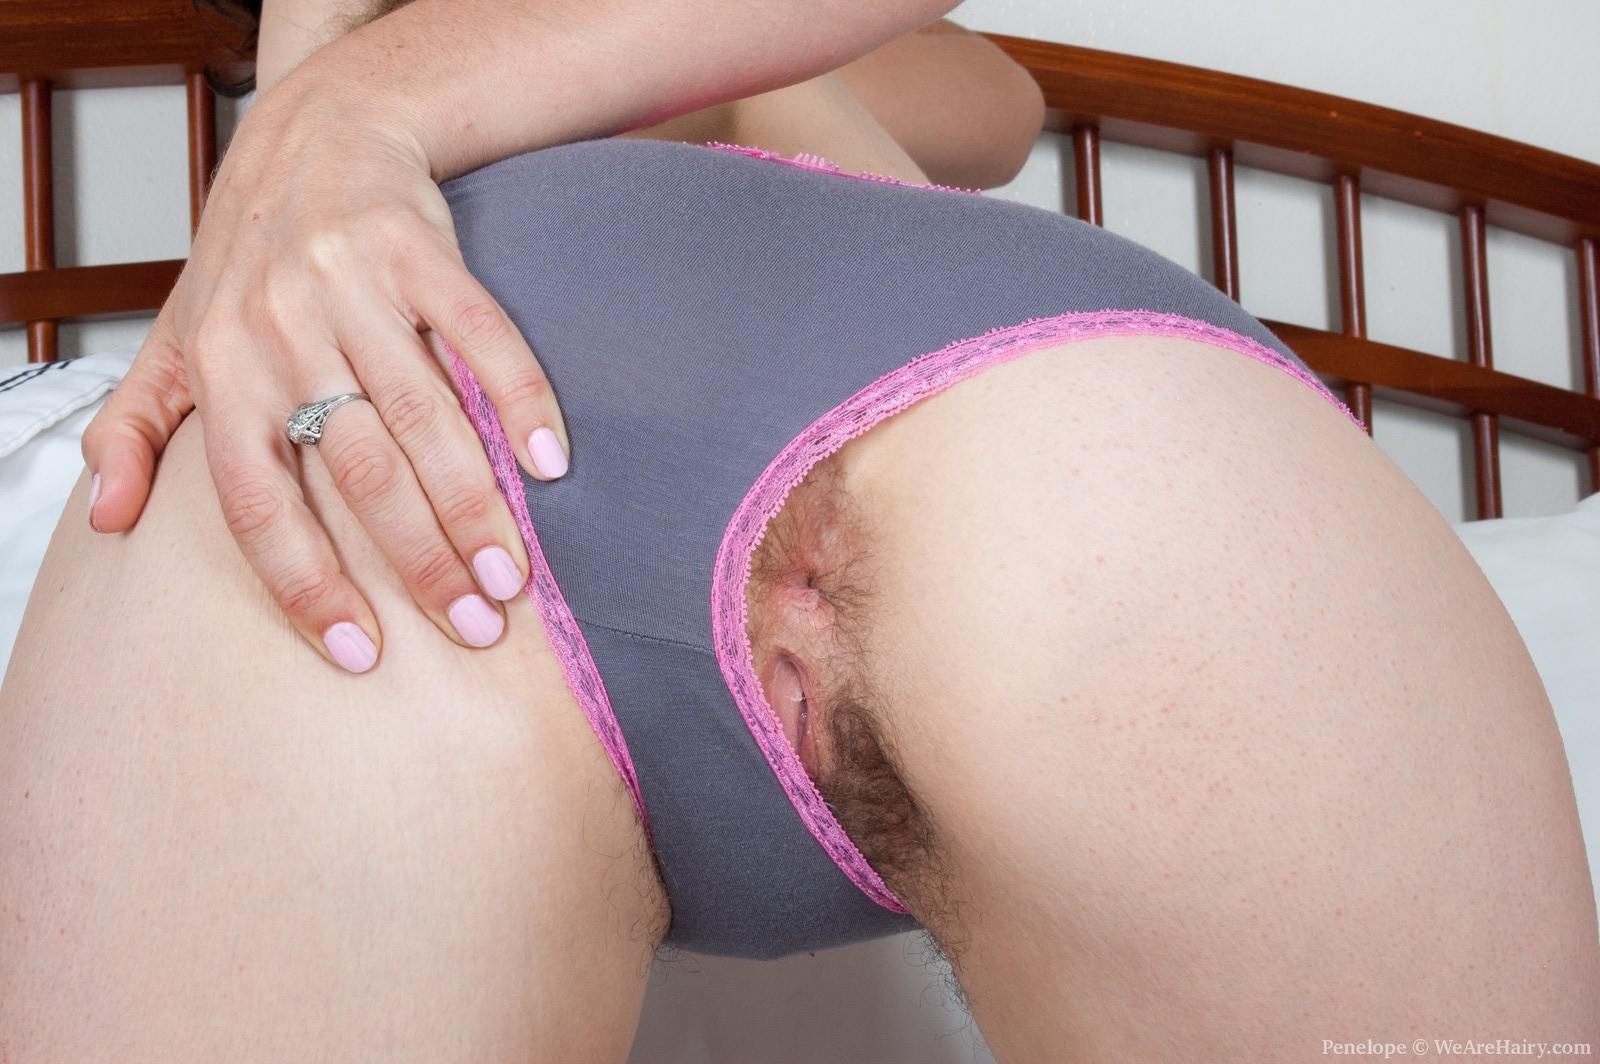 quality anal